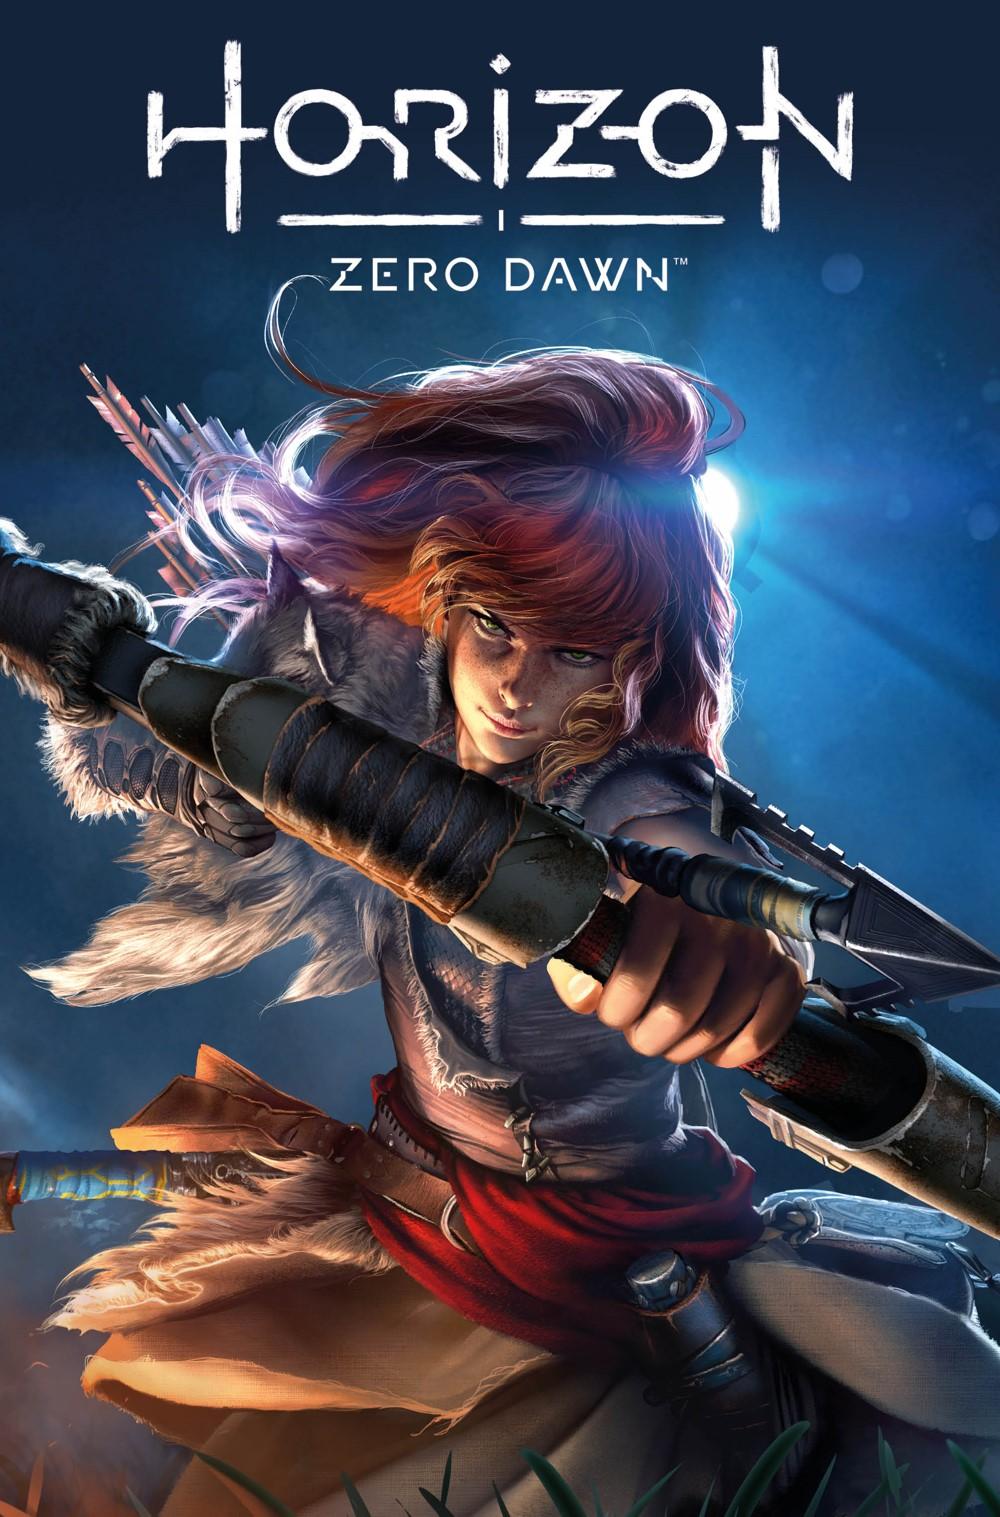 HorizonZeroDawn23_00_Cover_B-1 Titan Comics September 2021 Solicitations